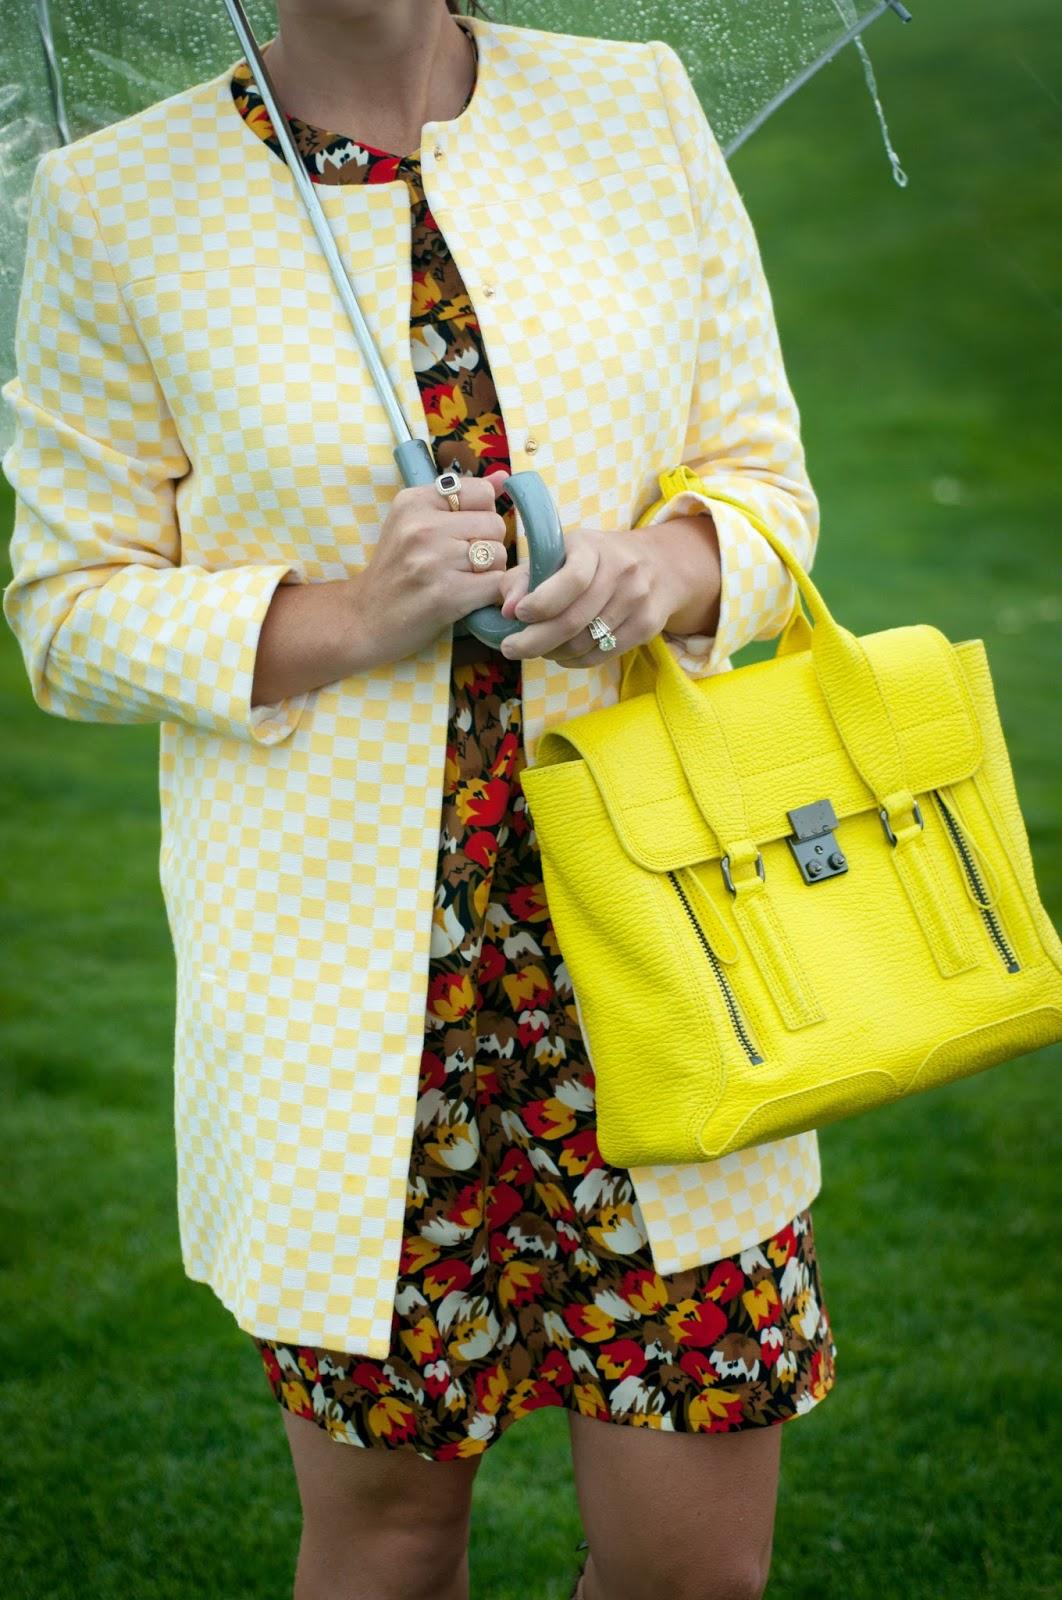 ootd, anthropologie dress, anthropologie ootd, phillip lim handbag, phillip lim pashli satchel, floral dress